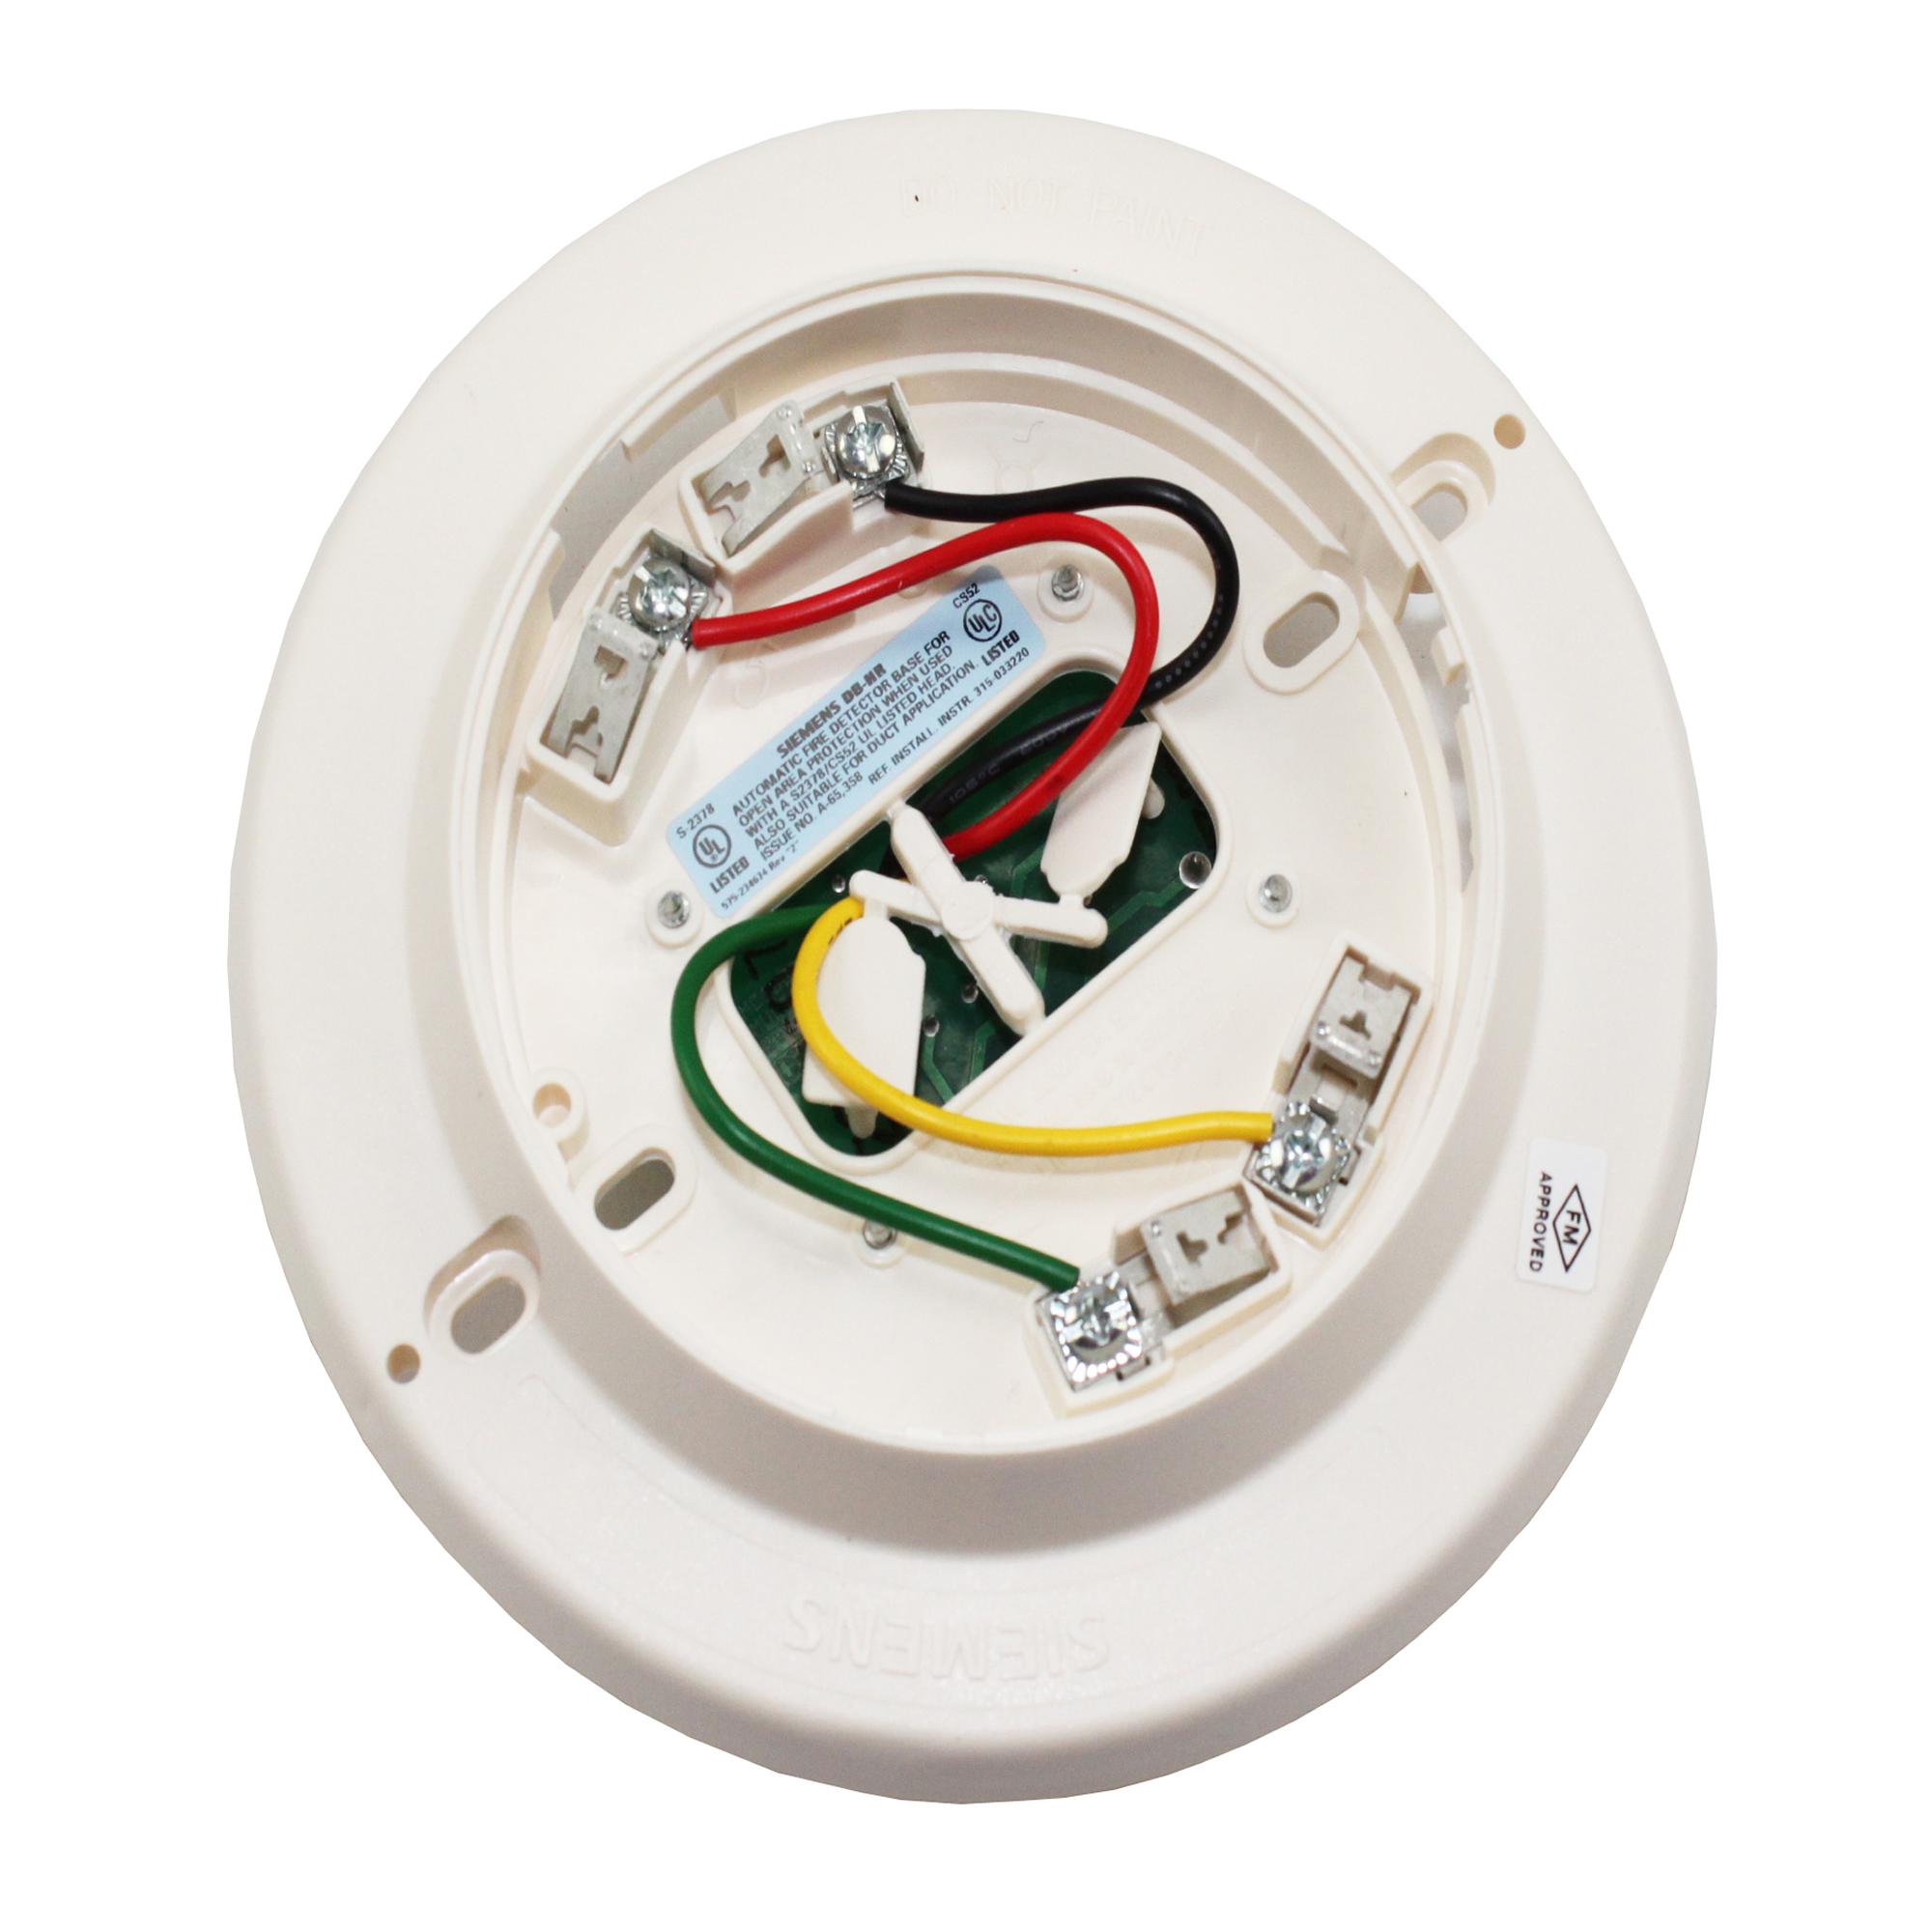 Siemens DB-HR Fire Alarm Smoke Detector Base 500-033220 -...